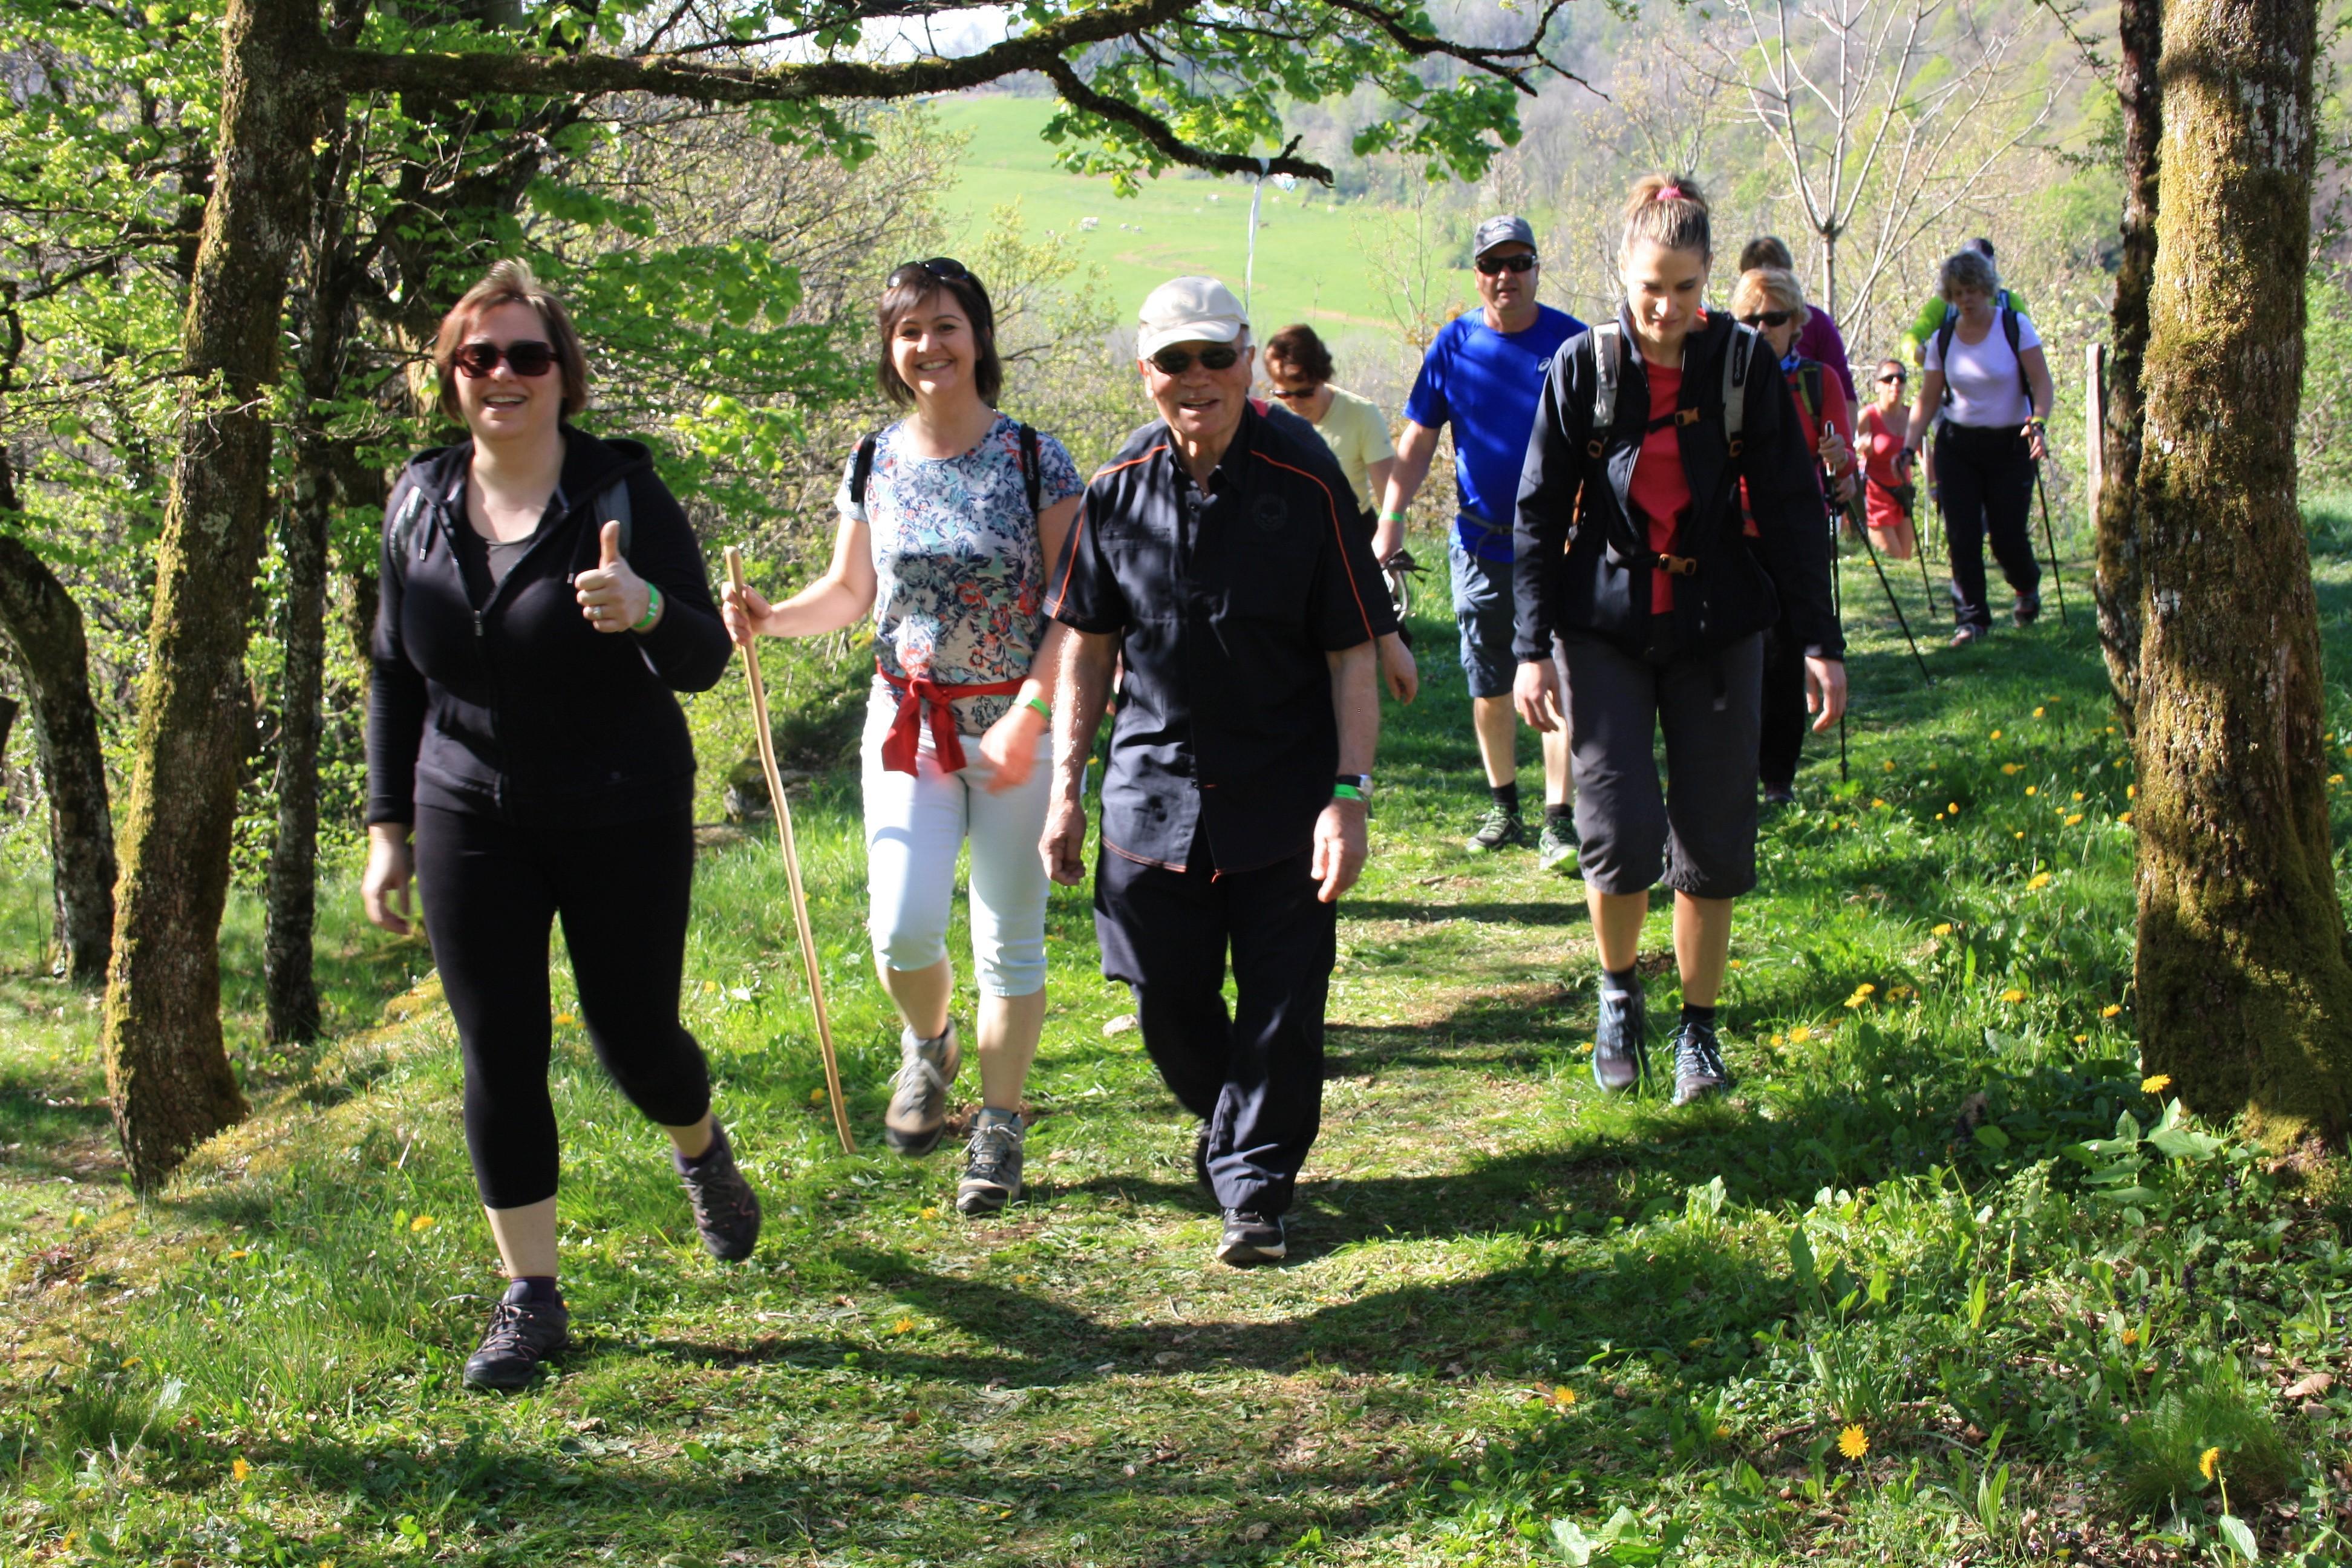 2017-04-09 - Trail-Montfaucon (214)